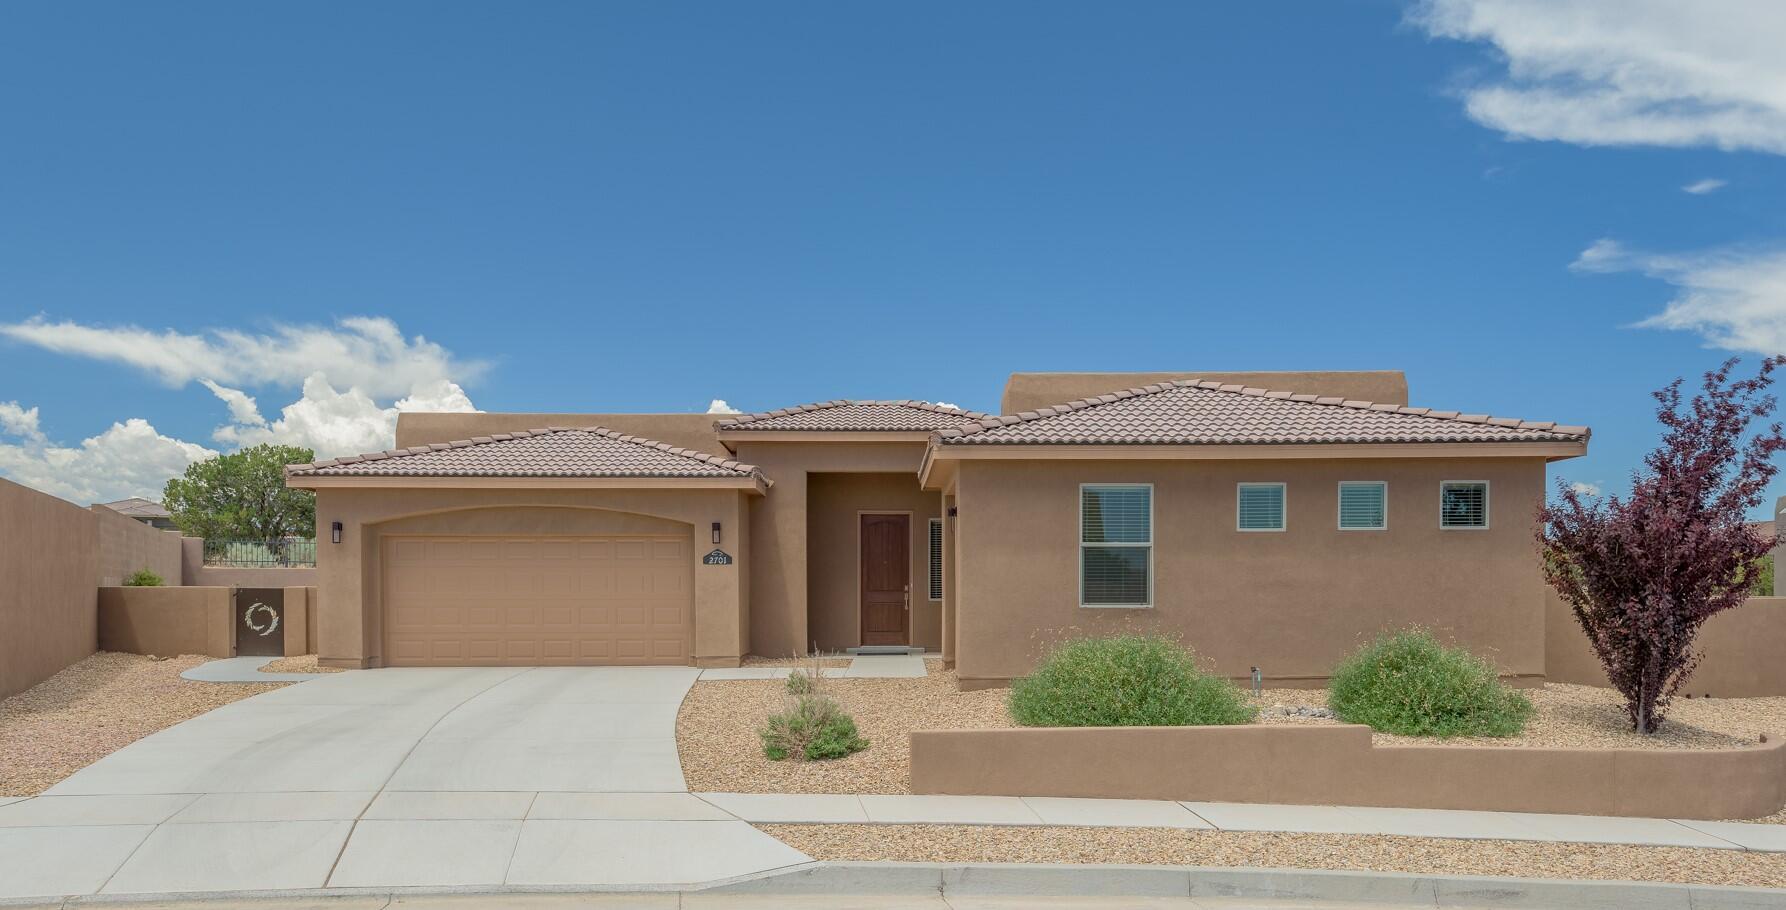 2701 Redondo Santa Fe Ne Property Photo 1